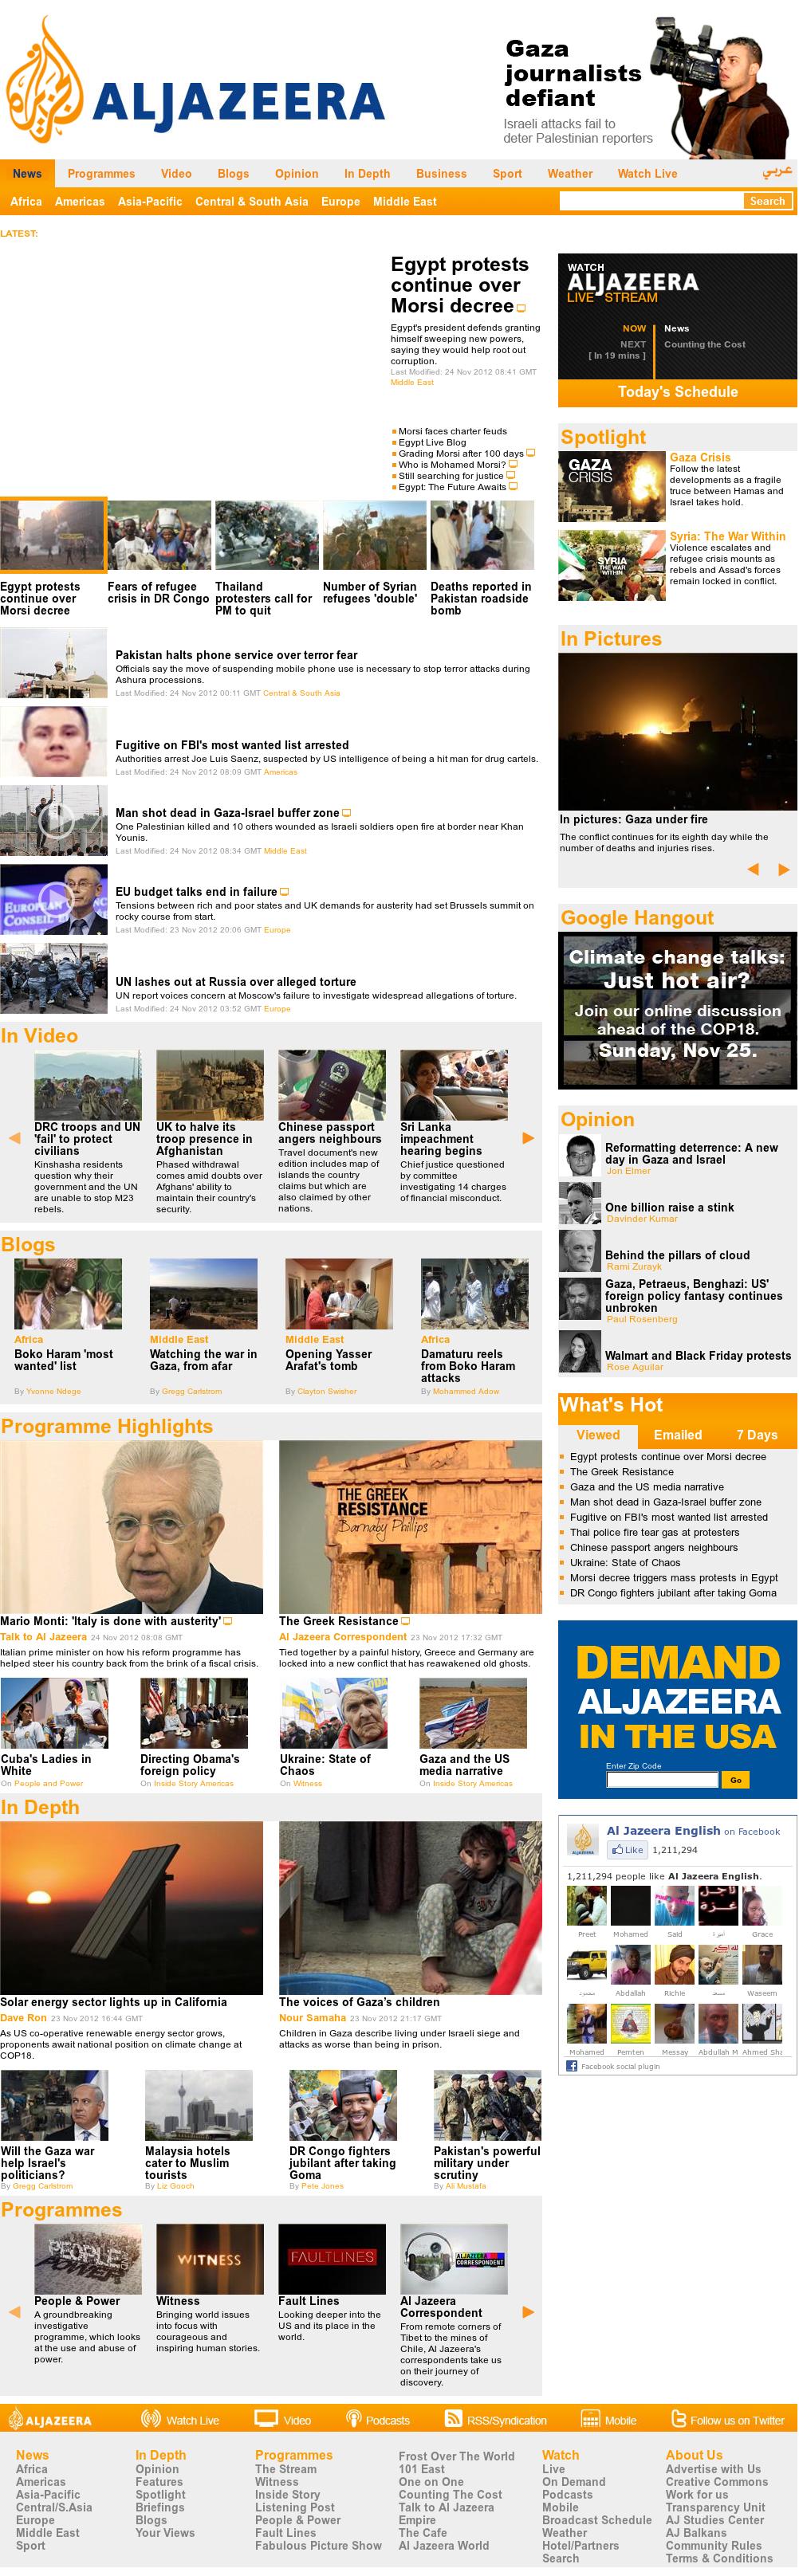 Al Jazeera (English) at Saturday Nov. 24, 2012, 9:16 a.m. UTC